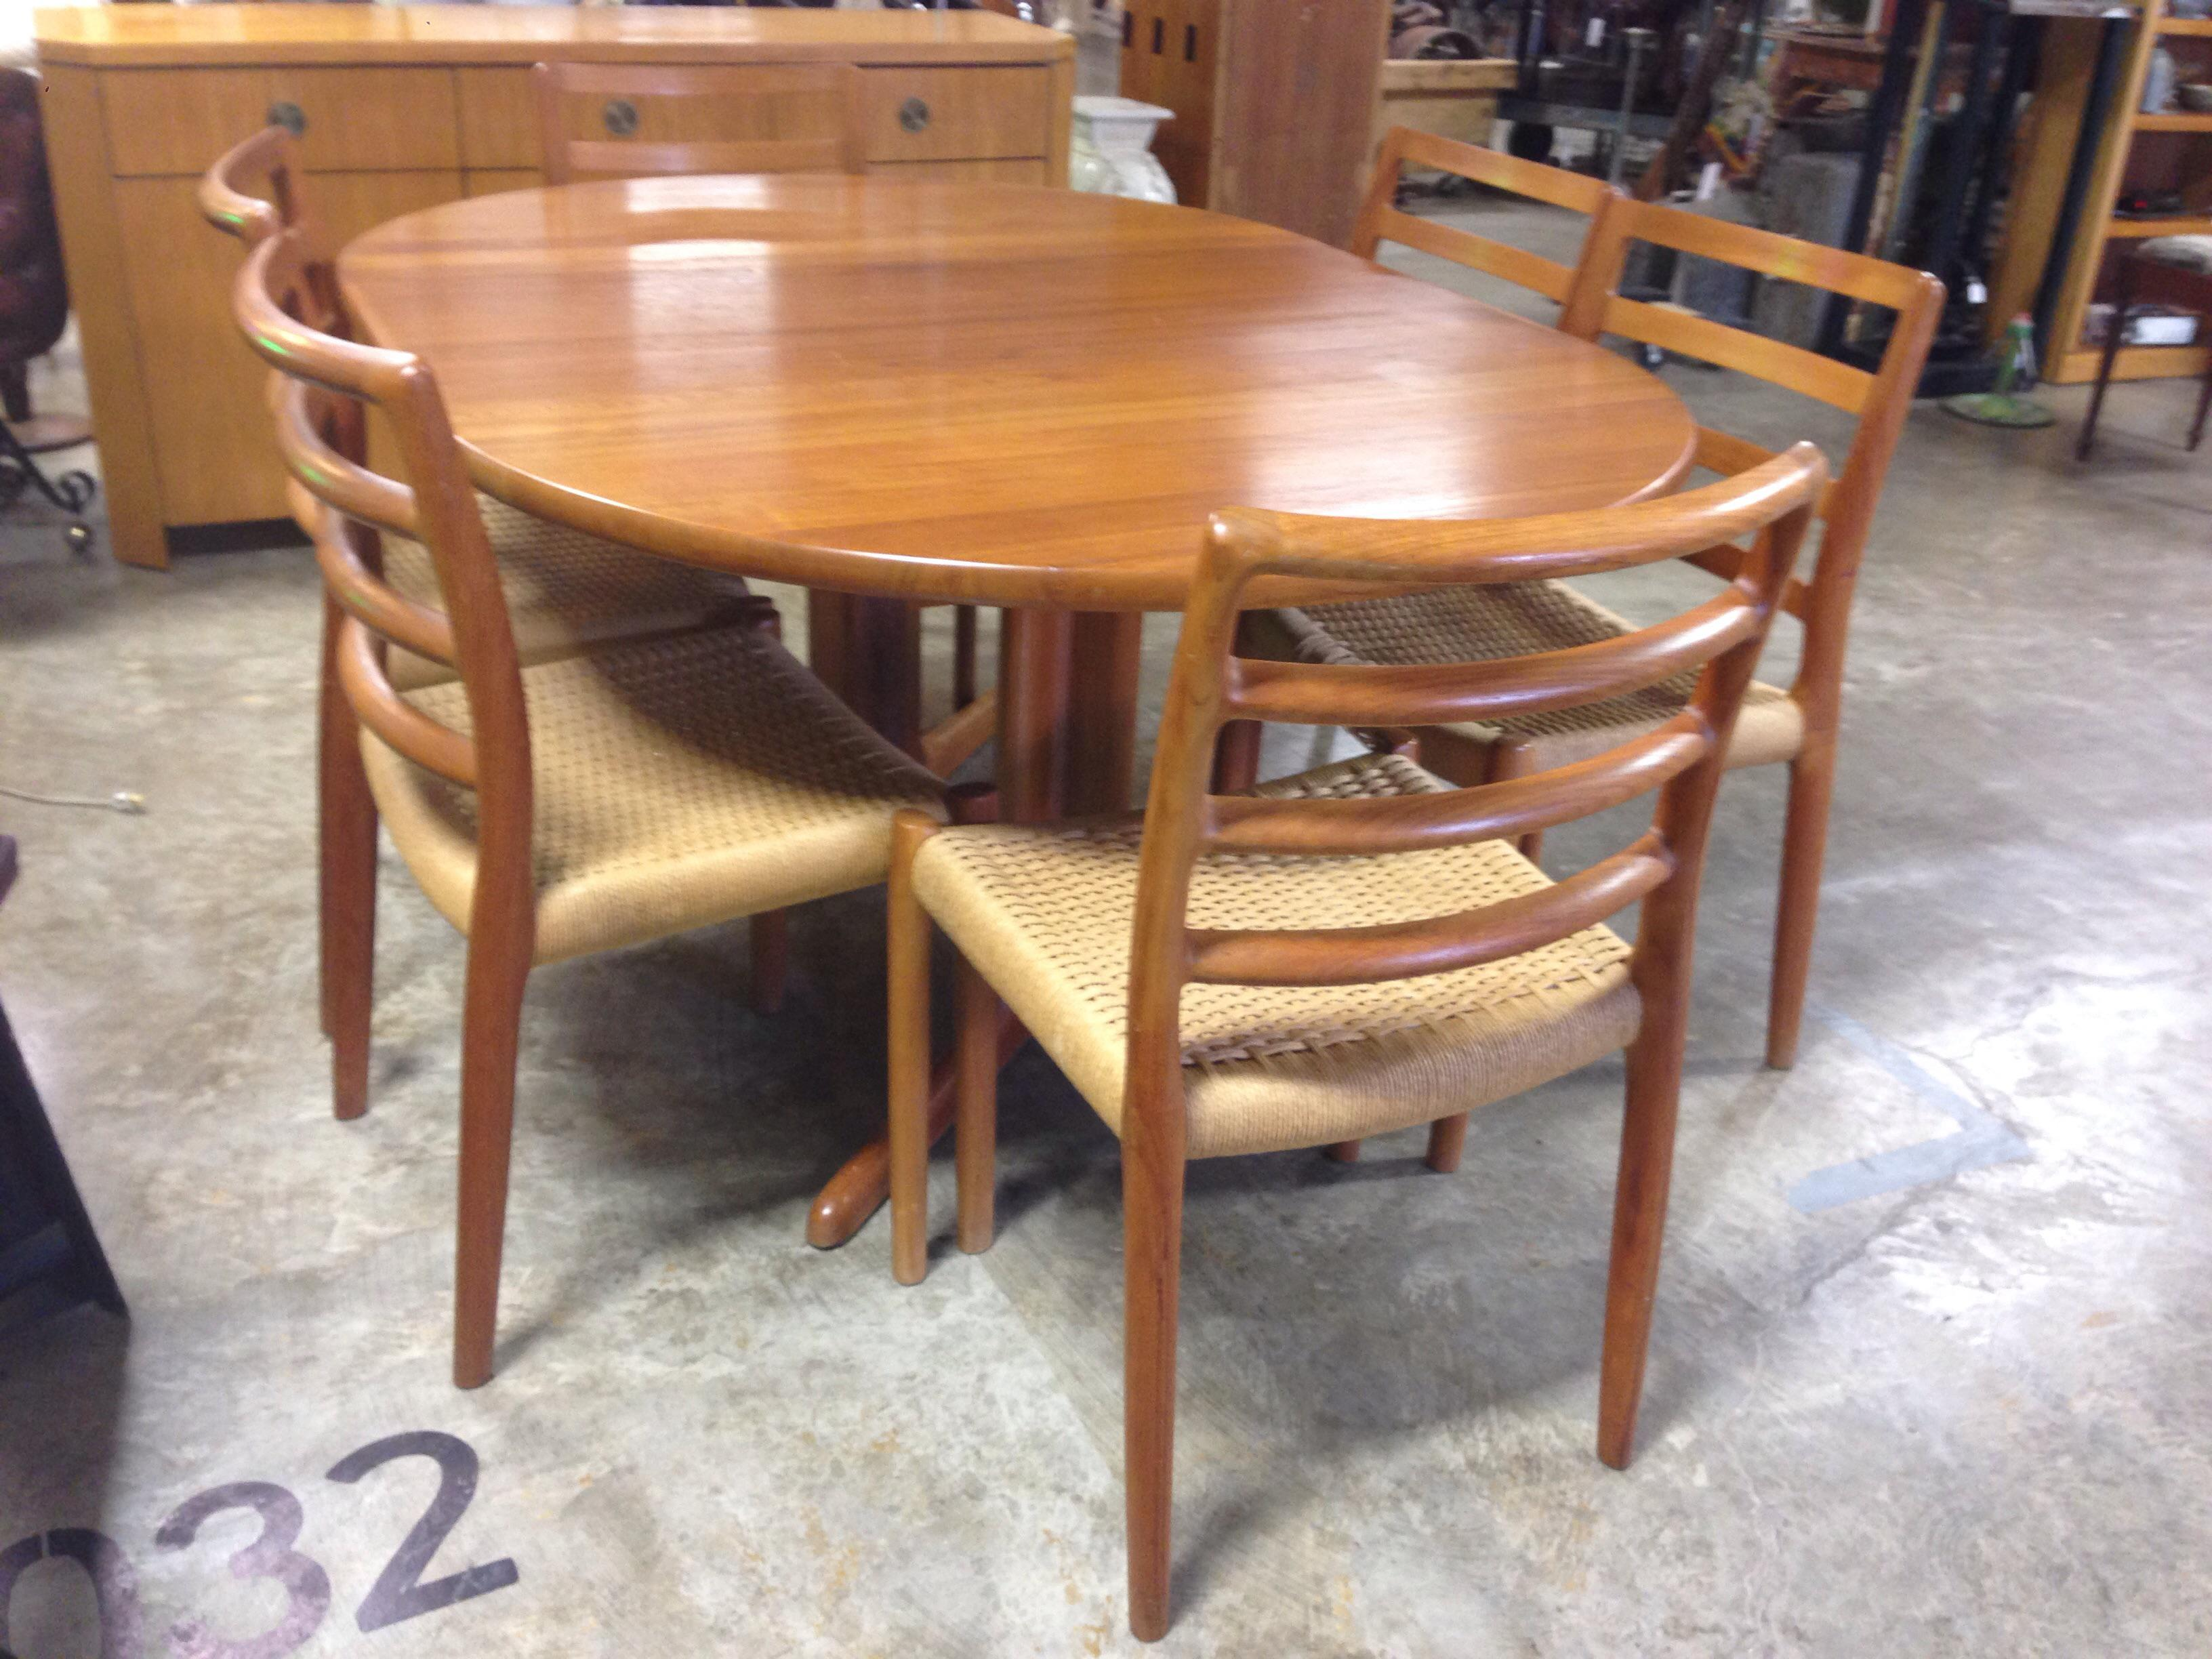 Danish Teak Dining Table 6 Ladder Back Chairs Chairish